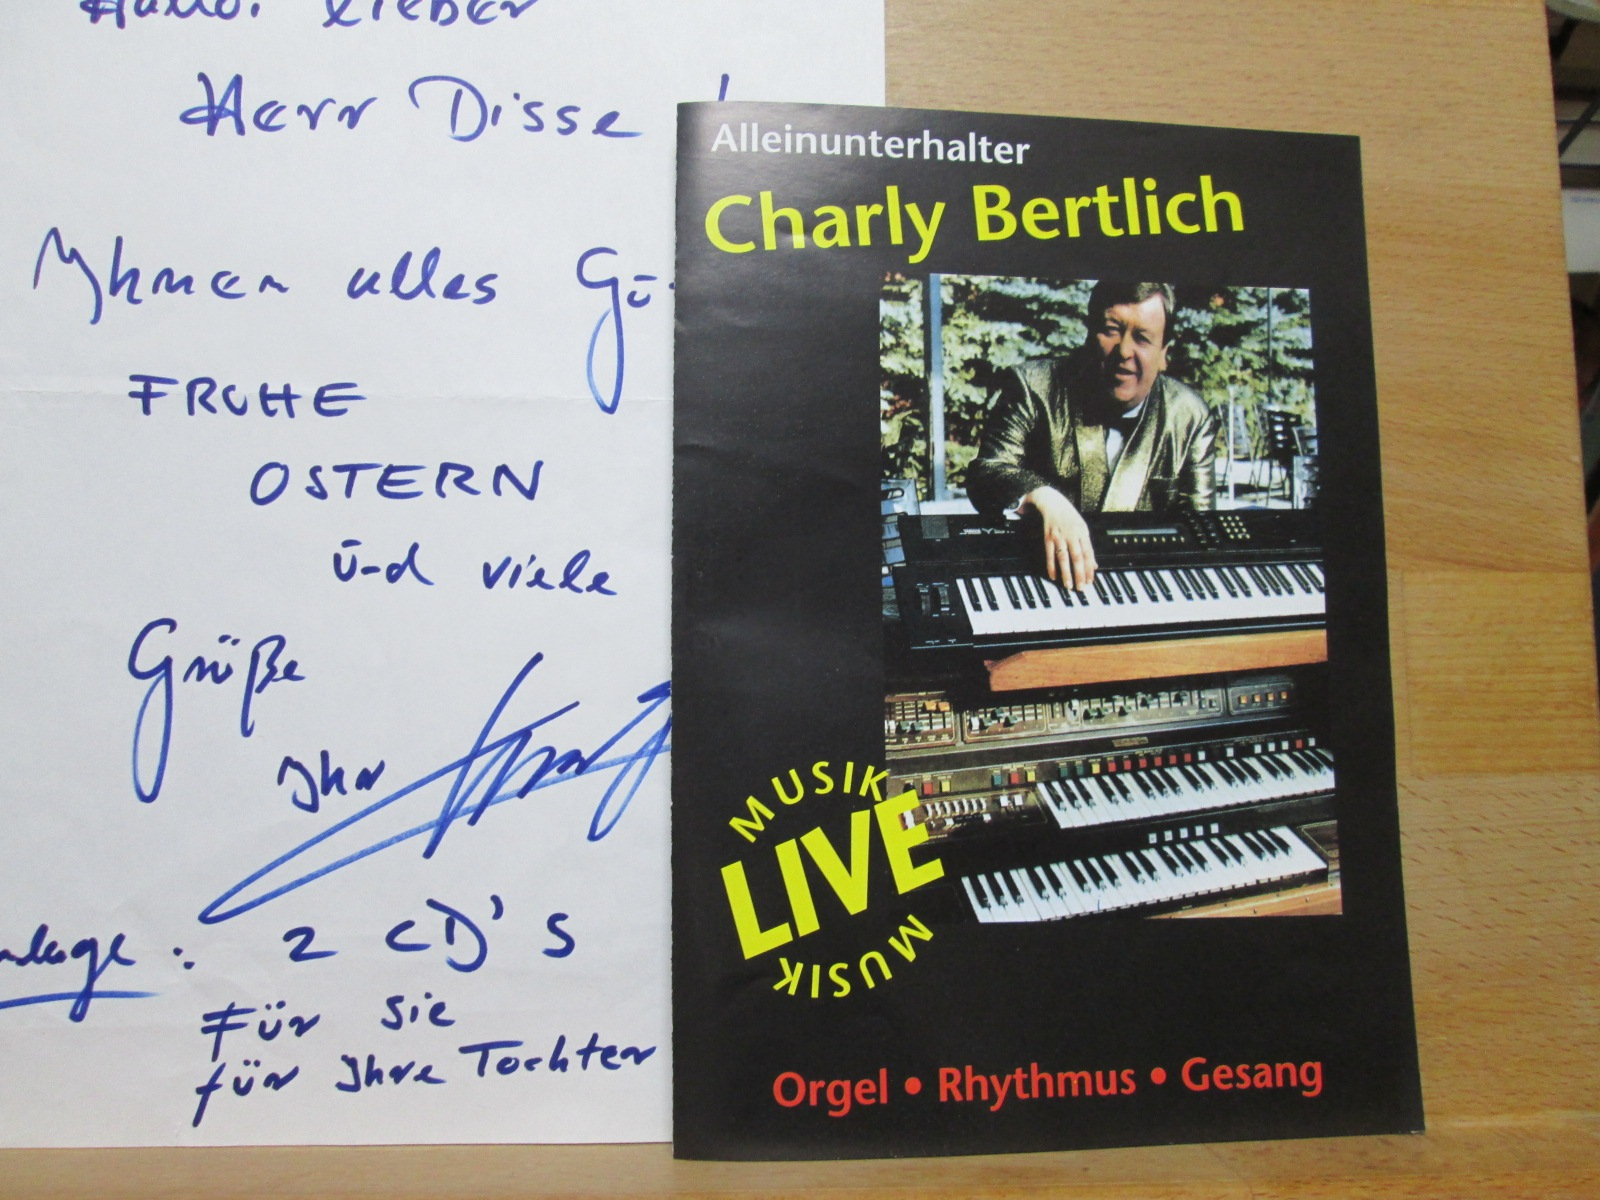 Konvolut Autogramme Charly Bertlich (1945-2001) Todesanzeige etc. /// Autogramm Autograph signiert signed signee